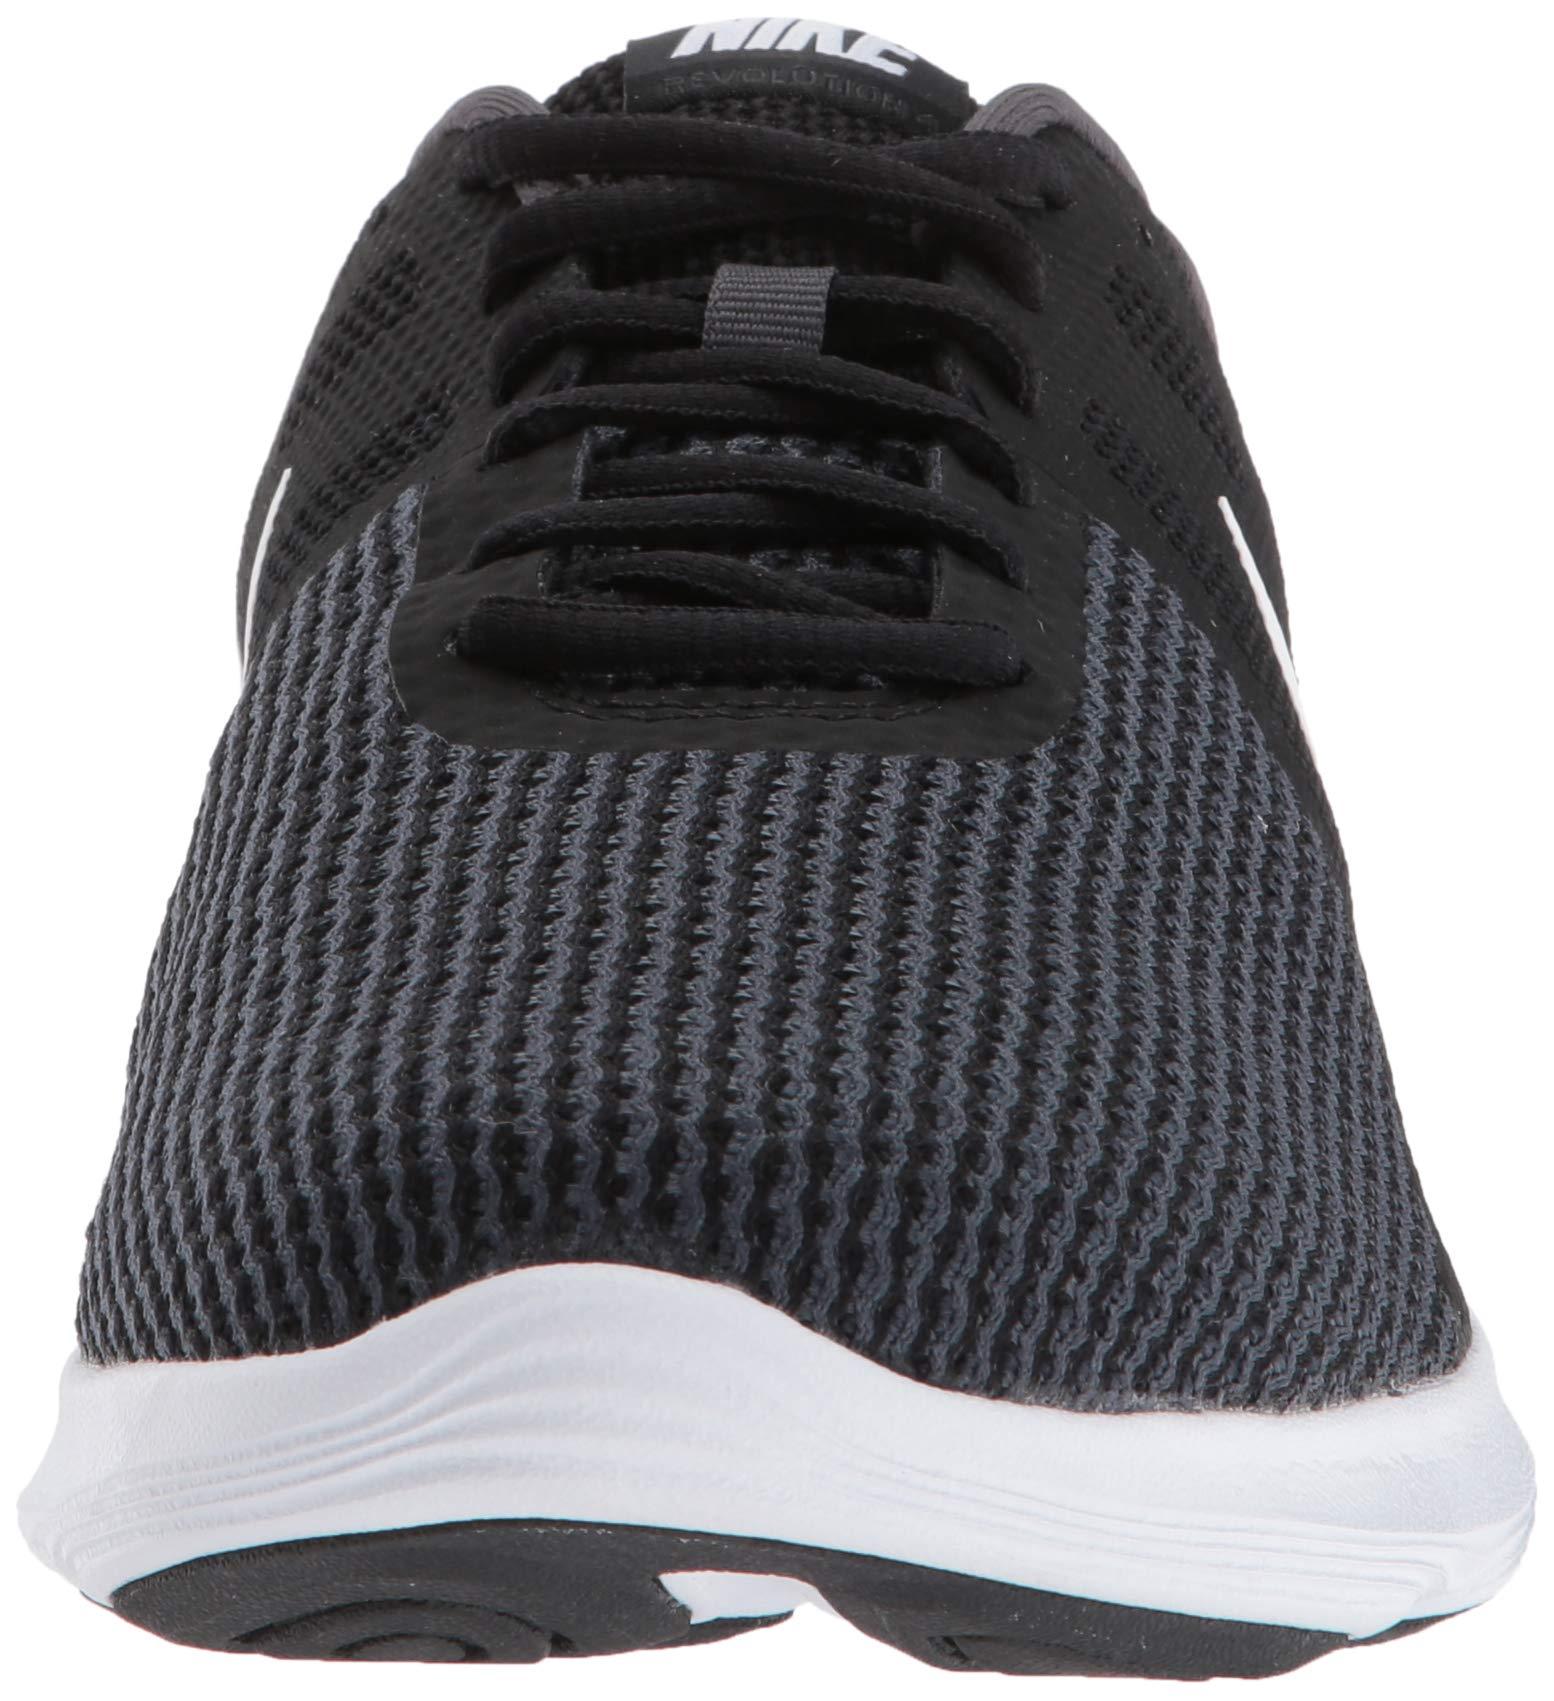 super popular 1a7f9 e0d46 NIKE Men s Revolution 4 Running Shoe